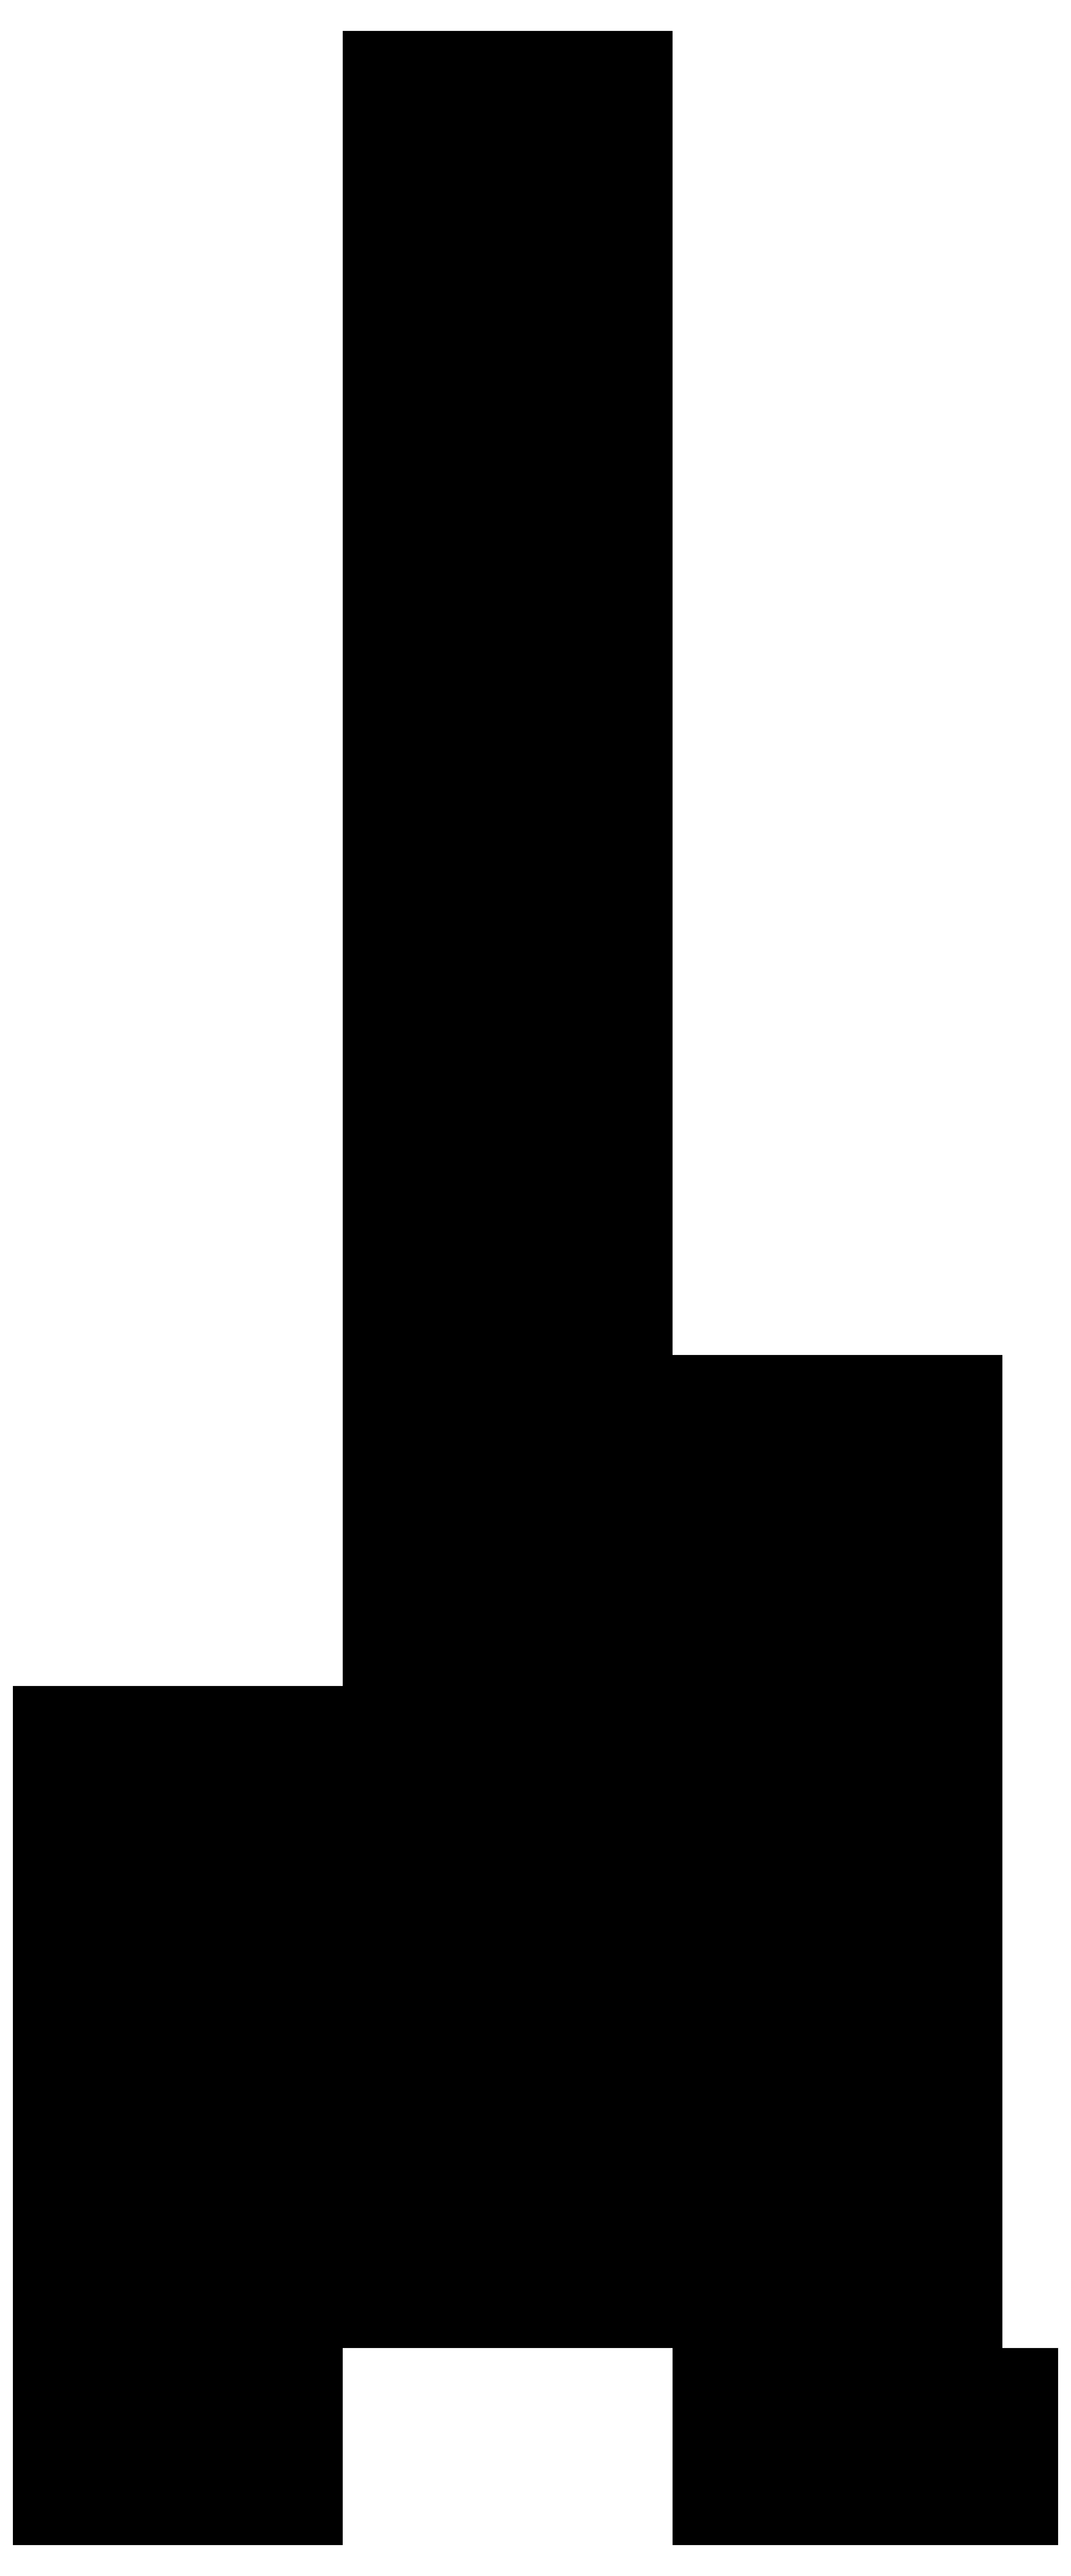 Transparent Eiffel Tower Silhouette Clip Art Image